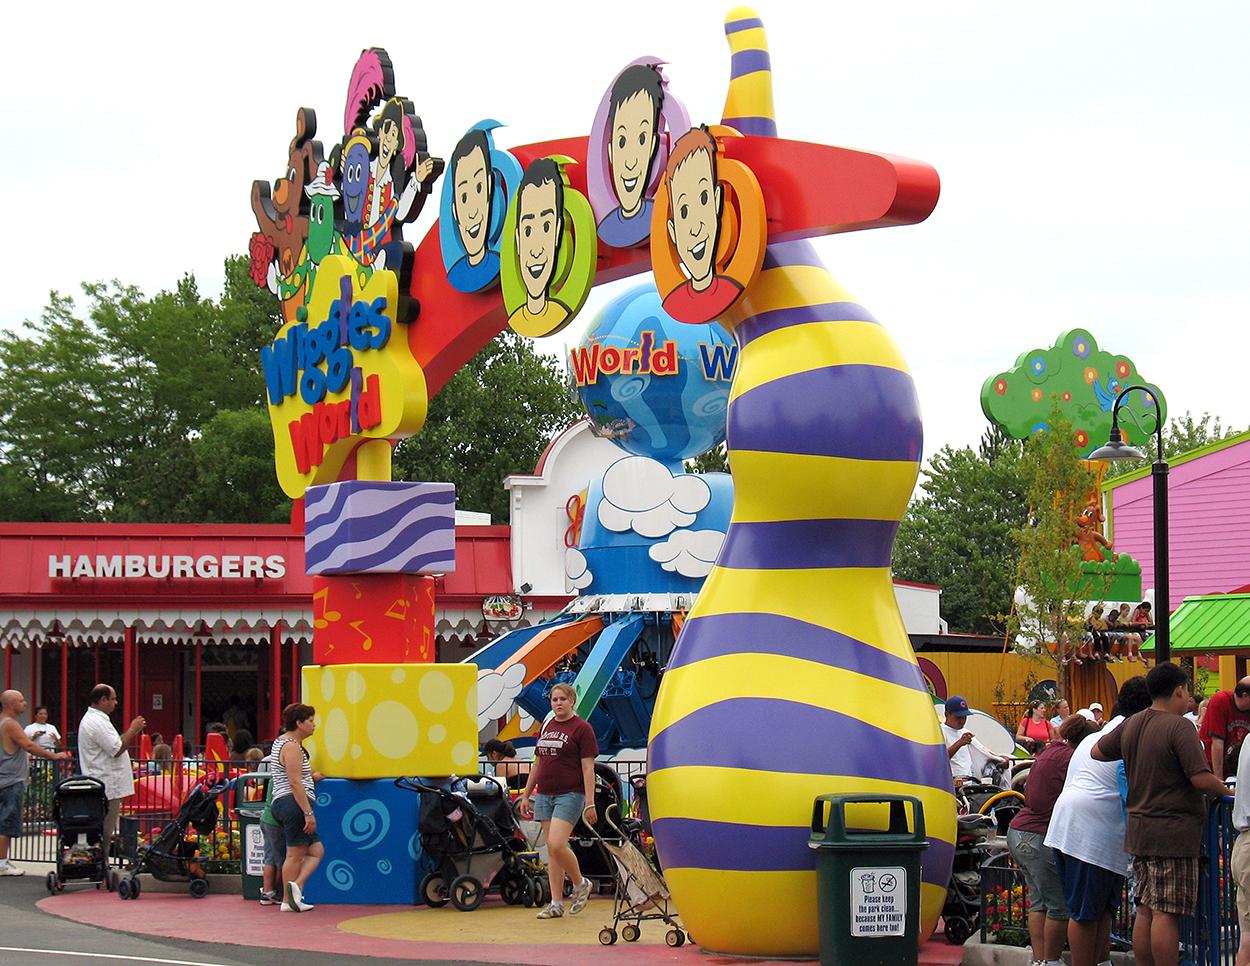 Wiggles World, Six Flags Great America